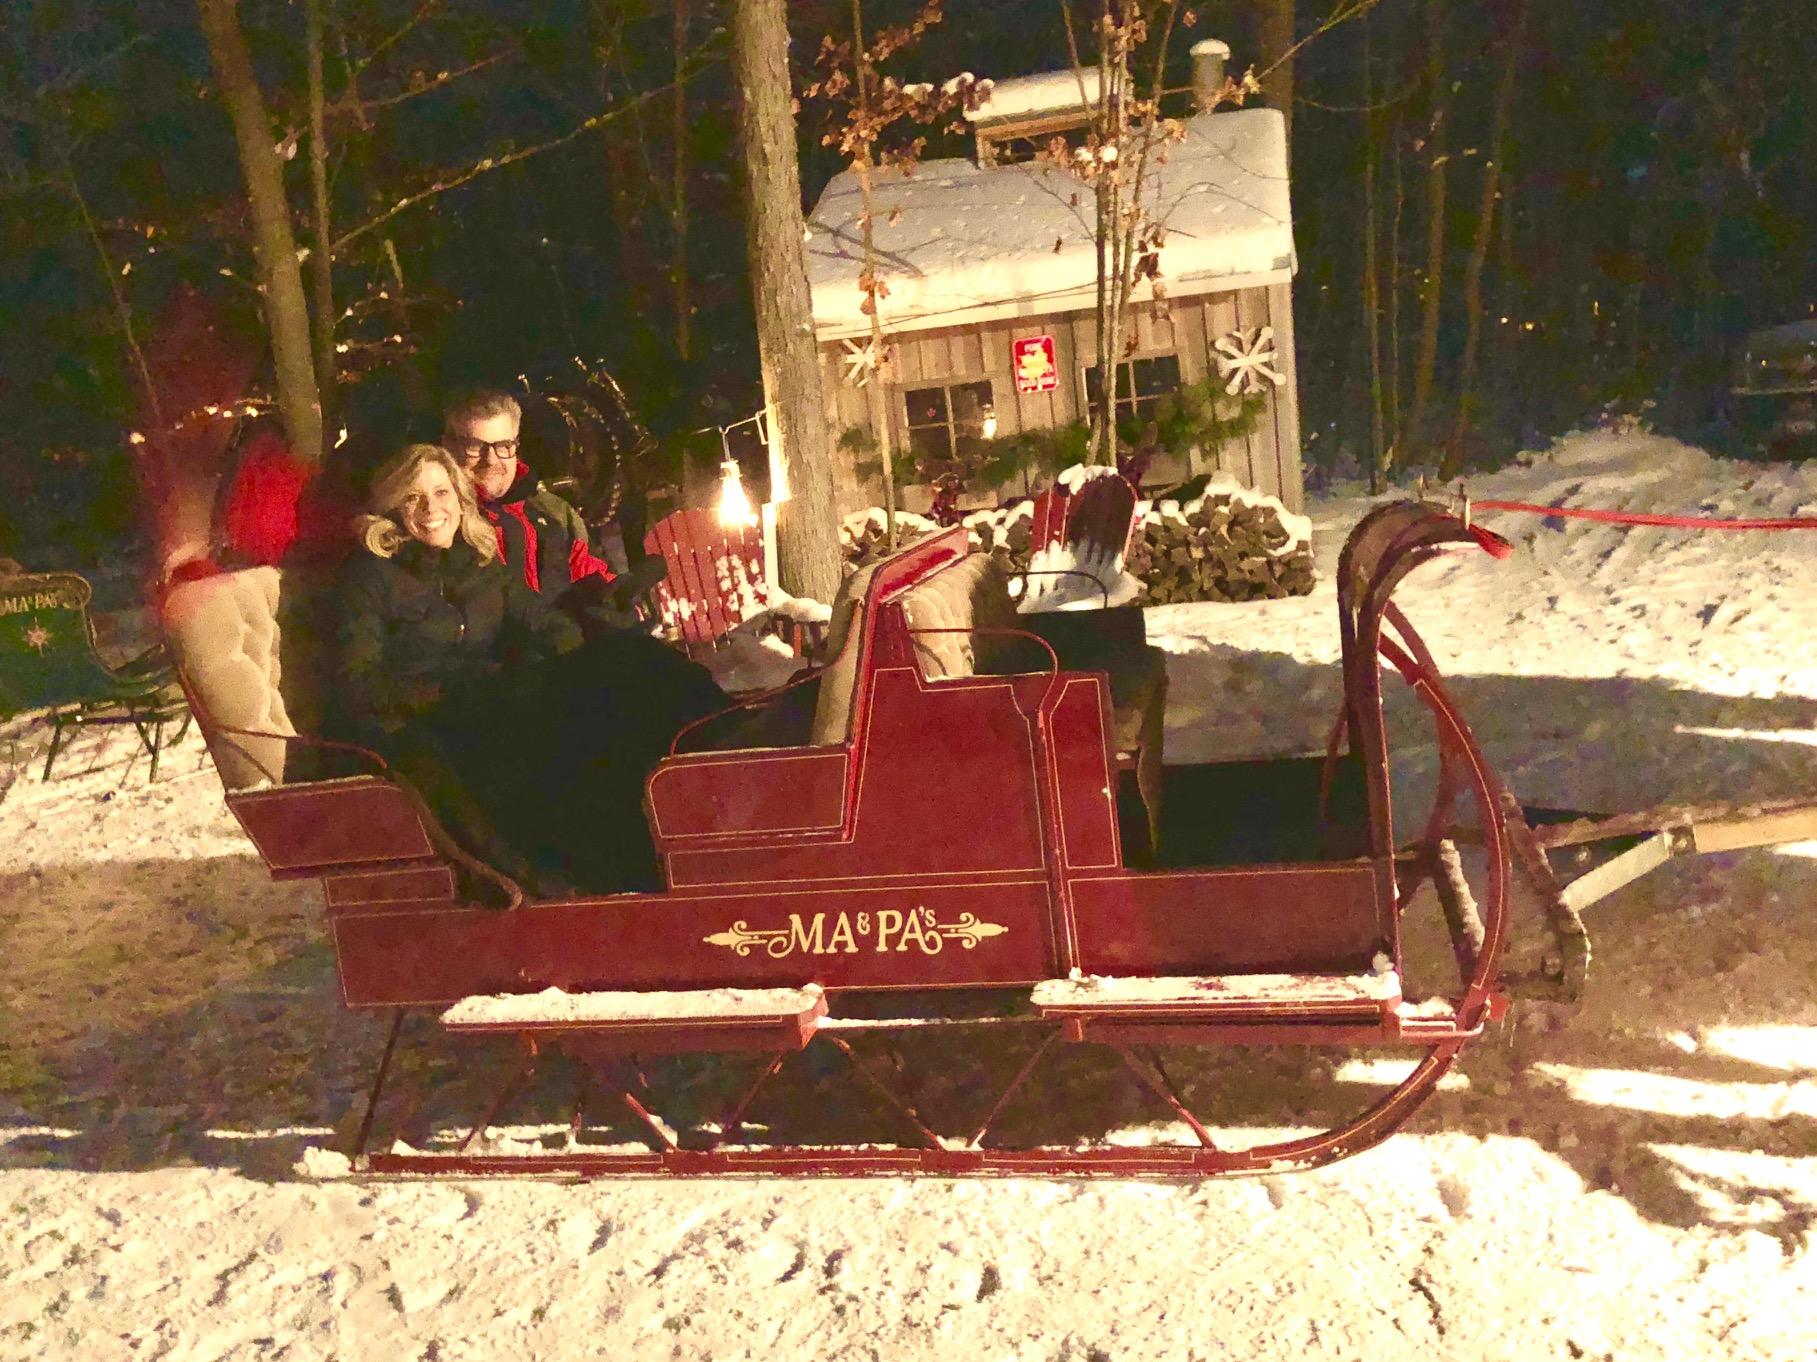 joe and wife red sleigh New Year Eve nite ride.jpg